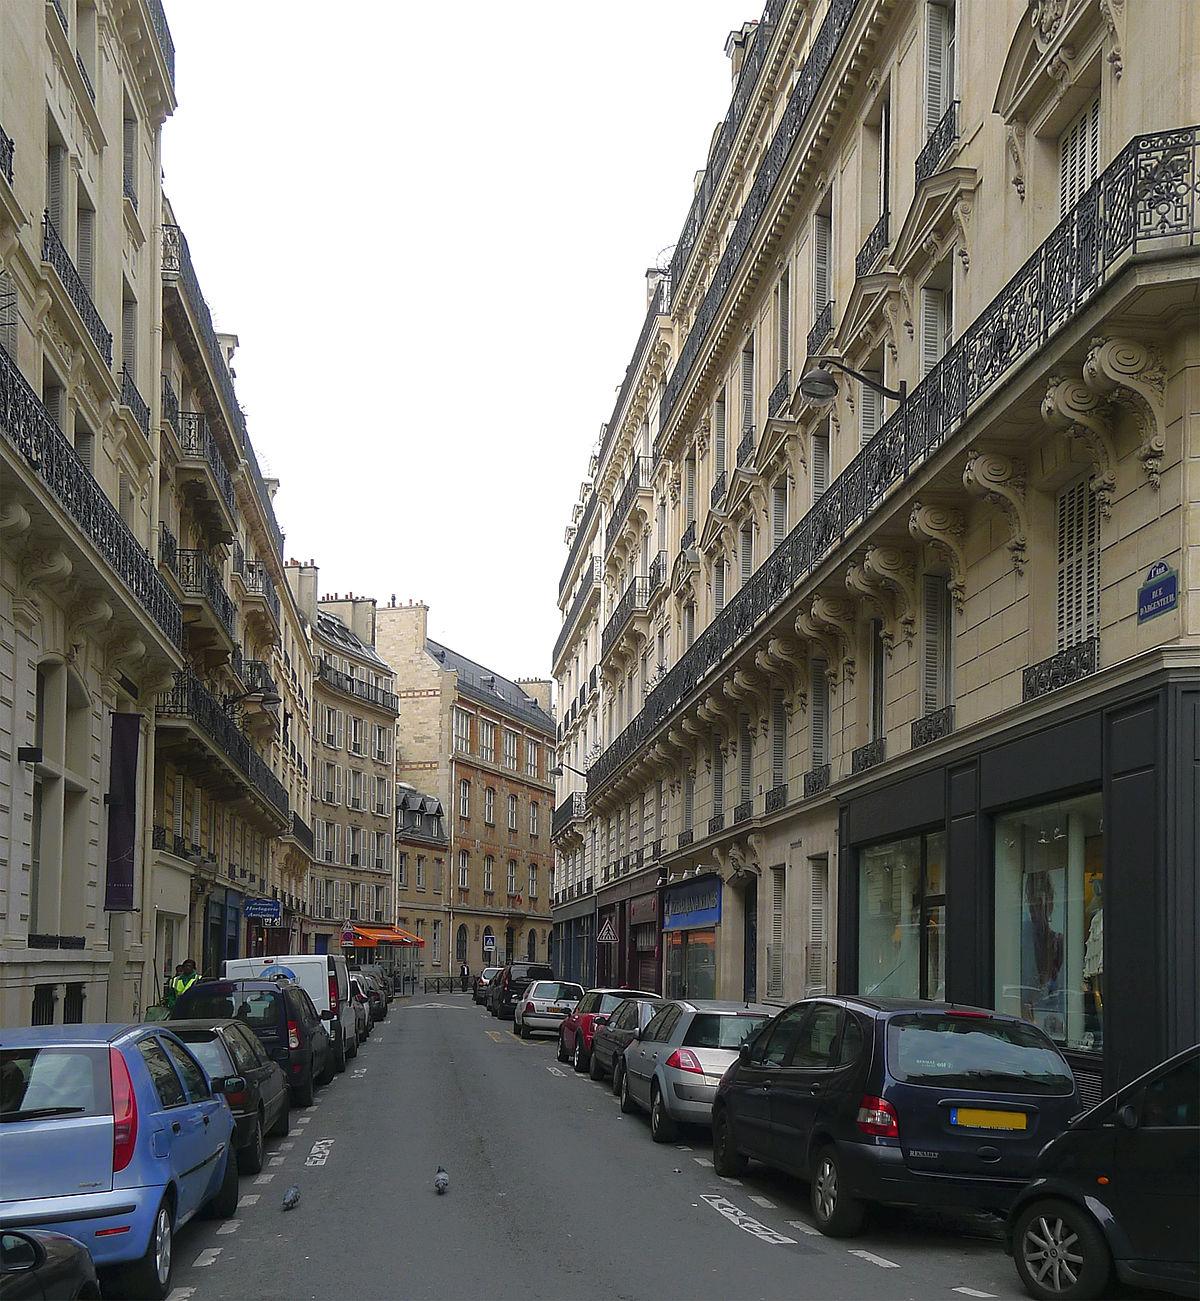 Rue d 39 argenteuil wikip dia - Piscine argenteuil ...